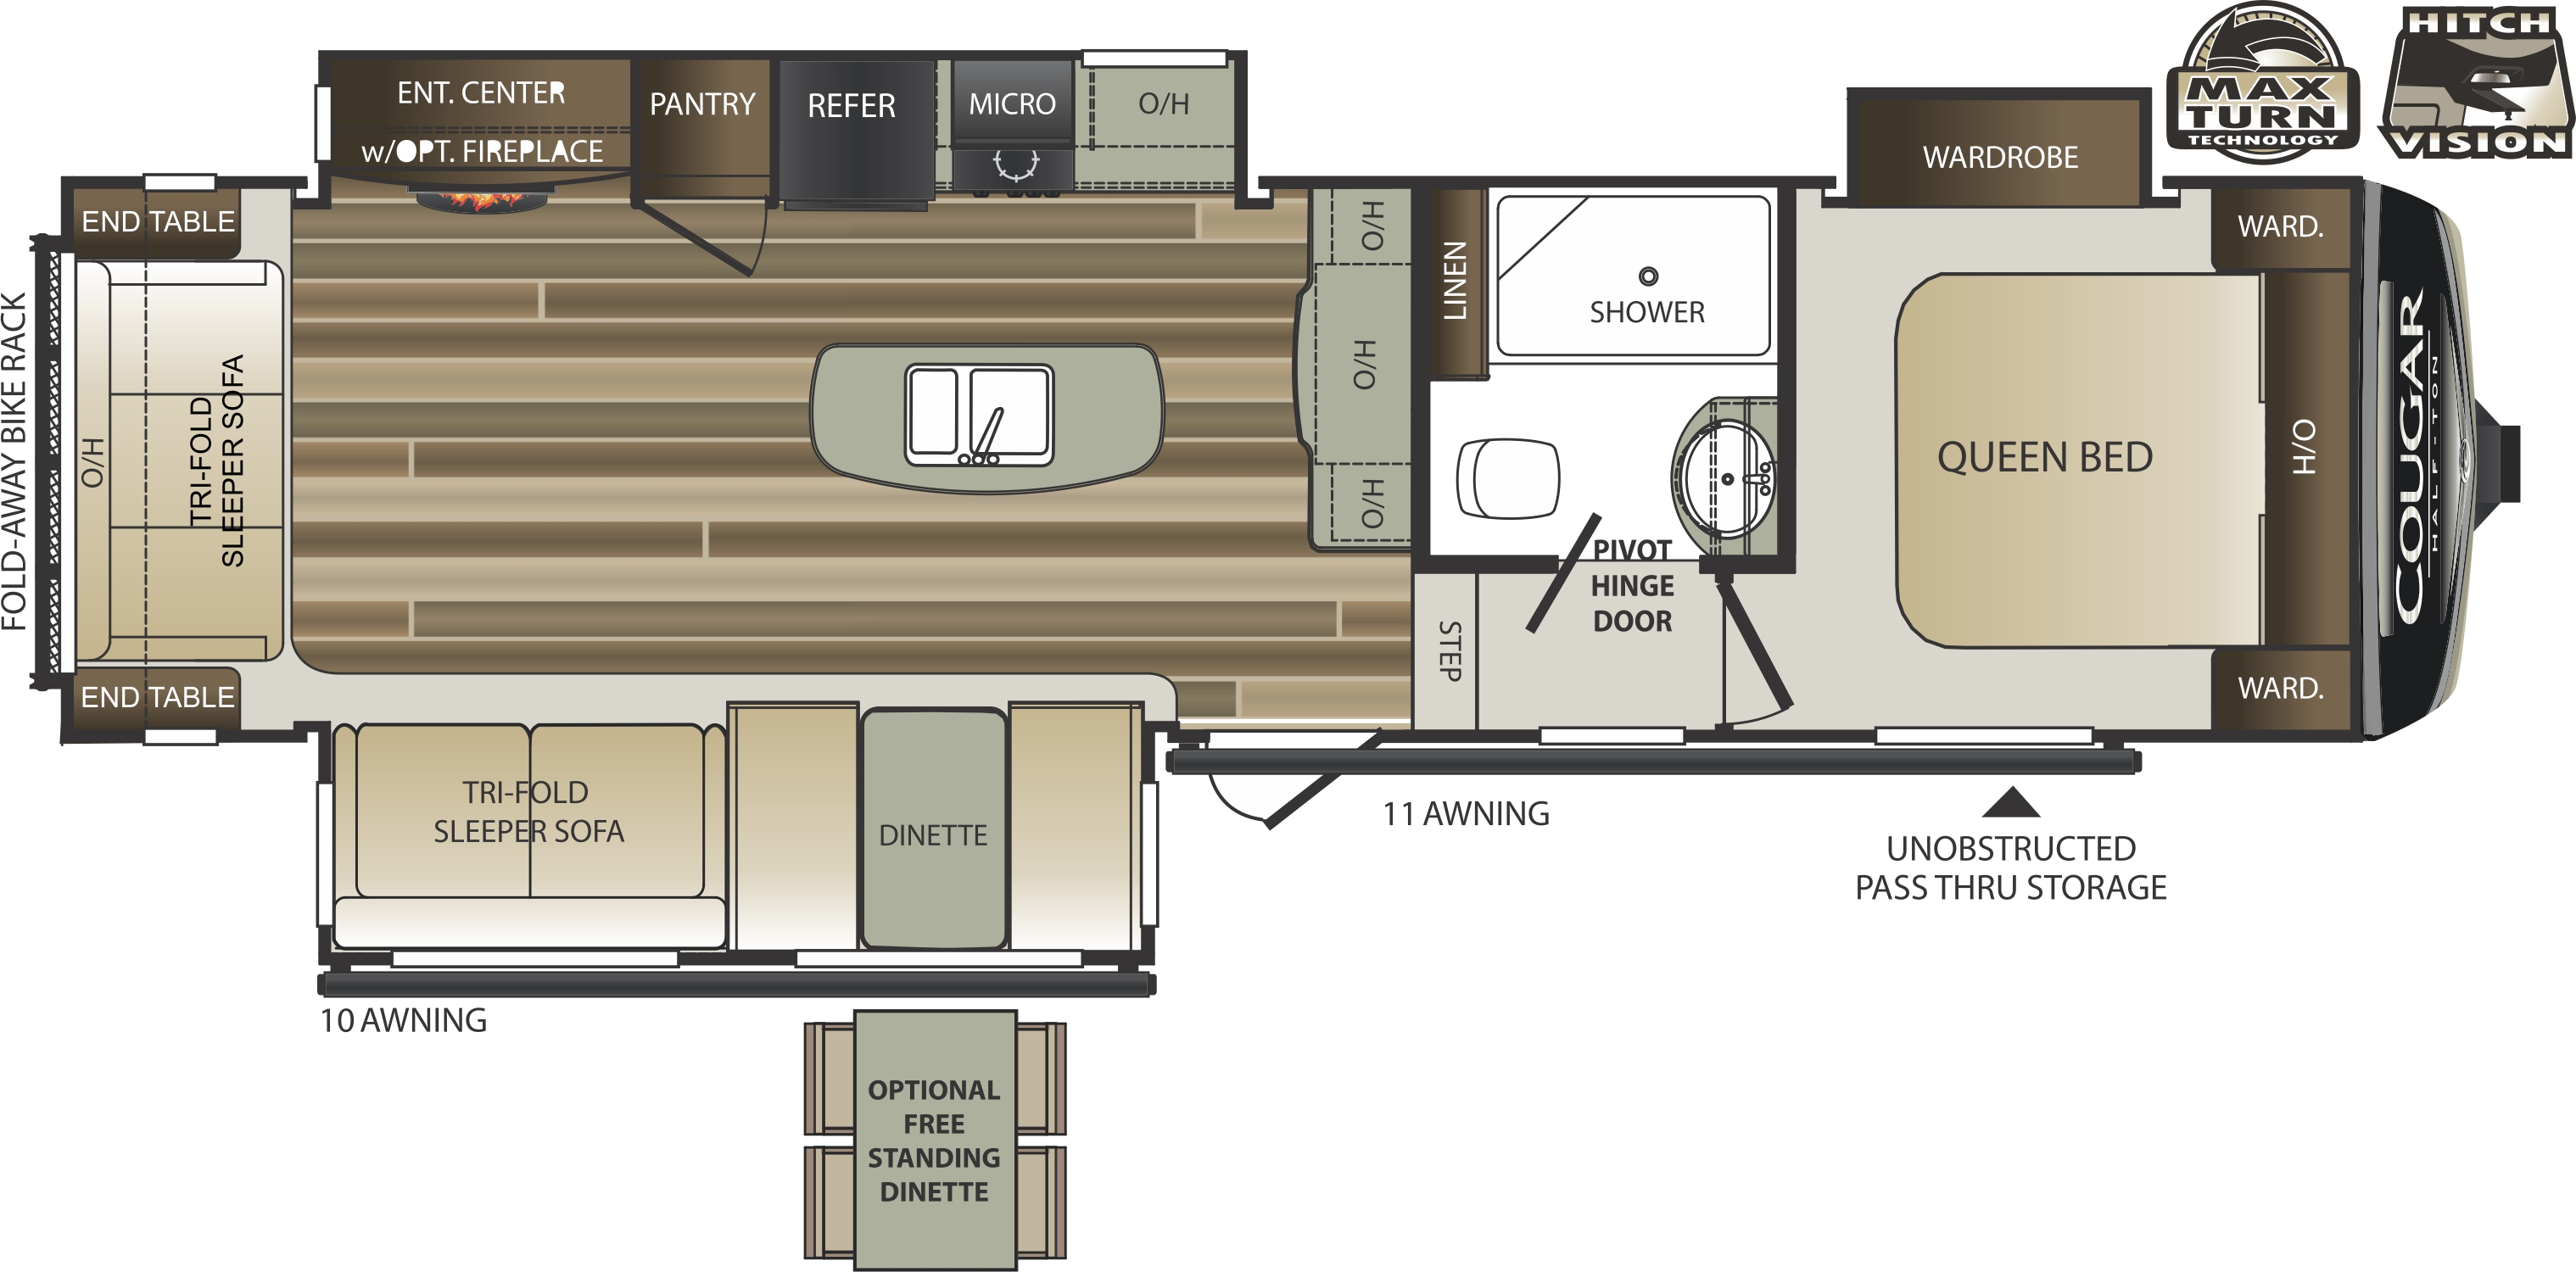 100 100 keystone rv floor plans keystone hideout rvs for Floor plans 5th wheel campers